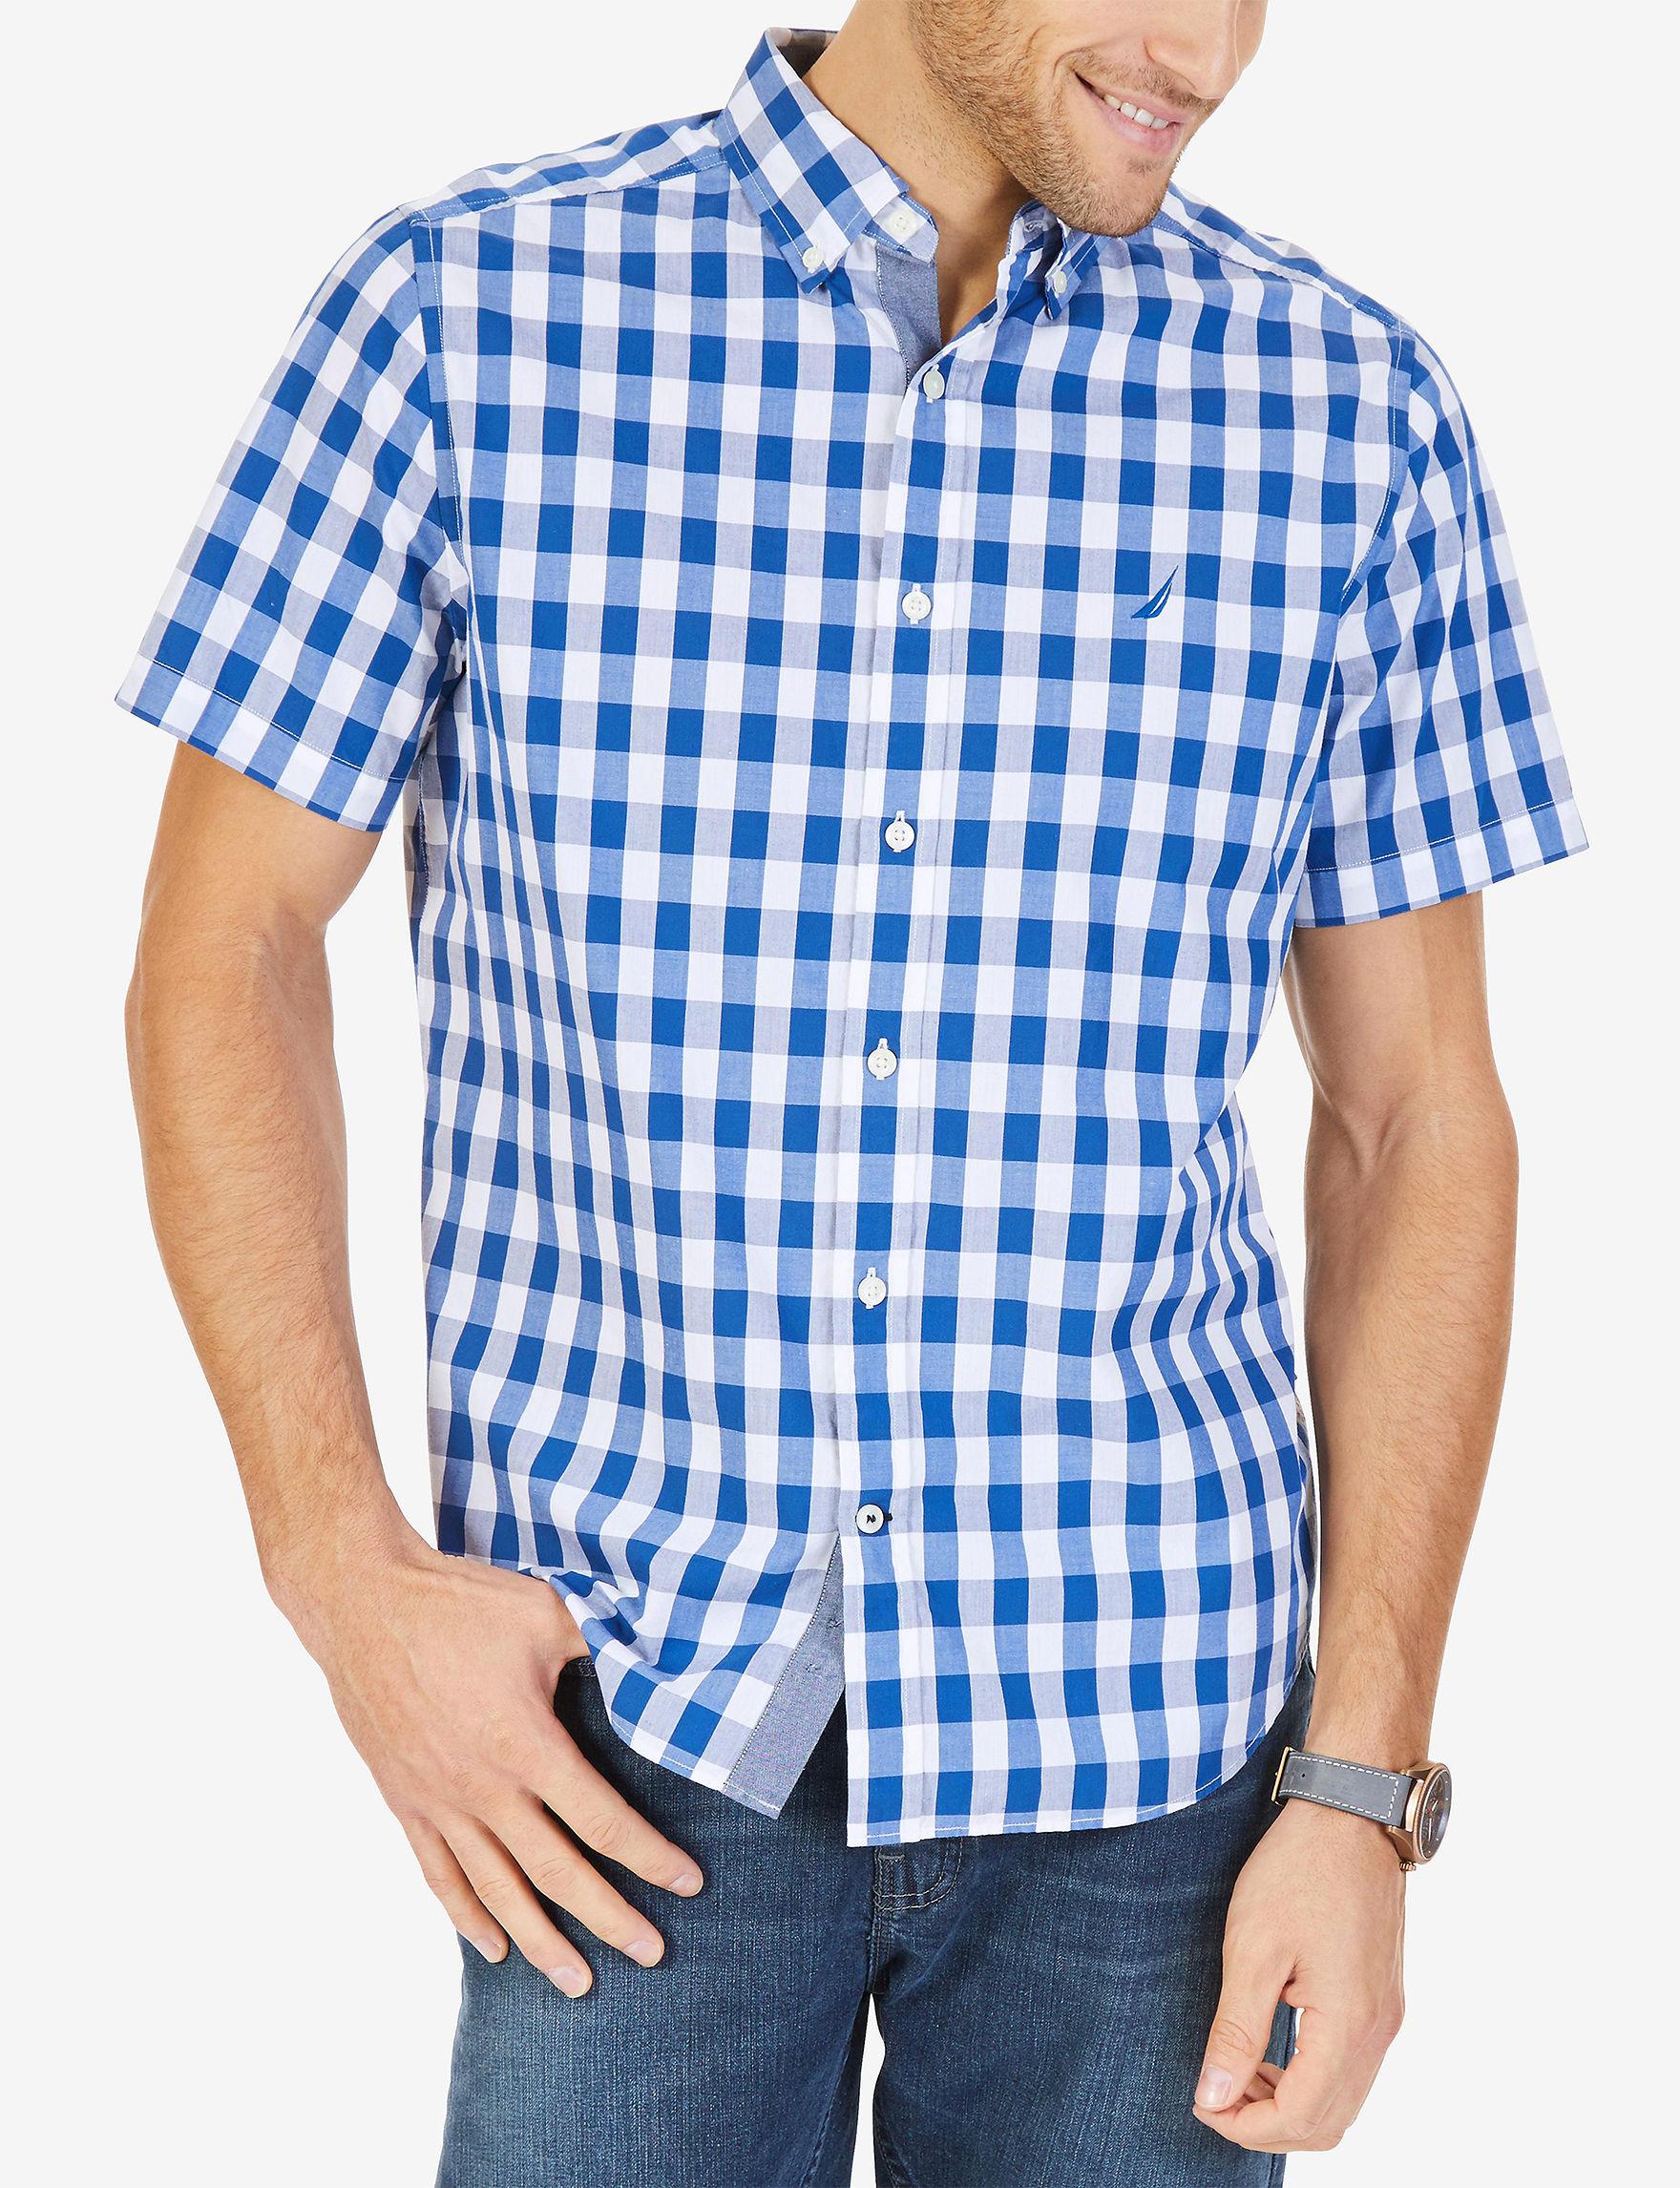 Nautica Blue / White Casual Button Down Shirts